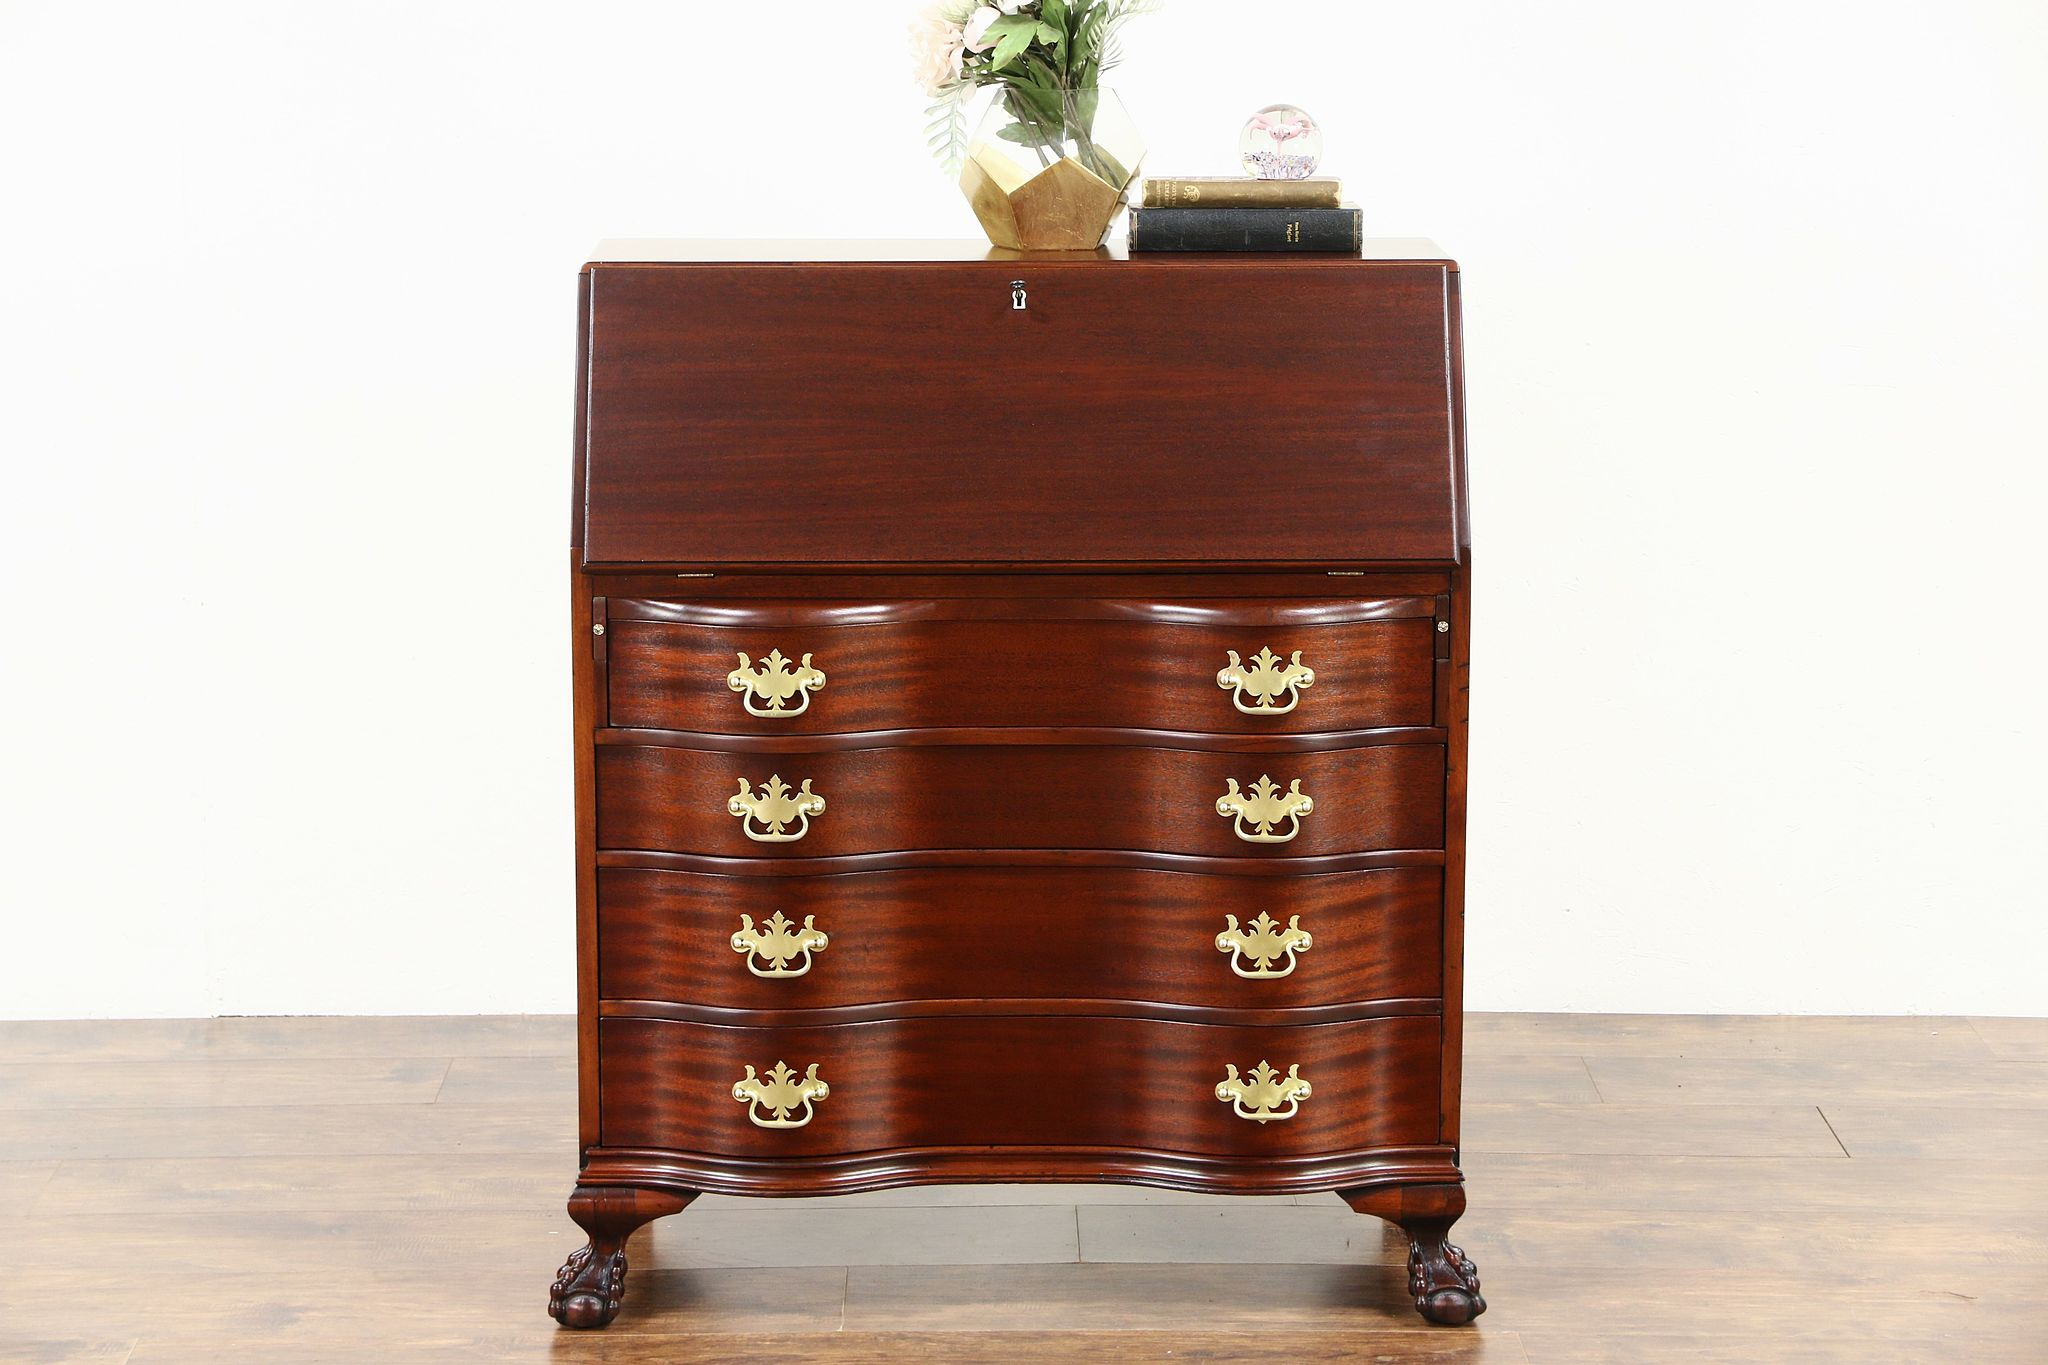 Famous SOLD - Secretary Desk, Mahogany 1930's Vintage Serpentine Drawers  KL72